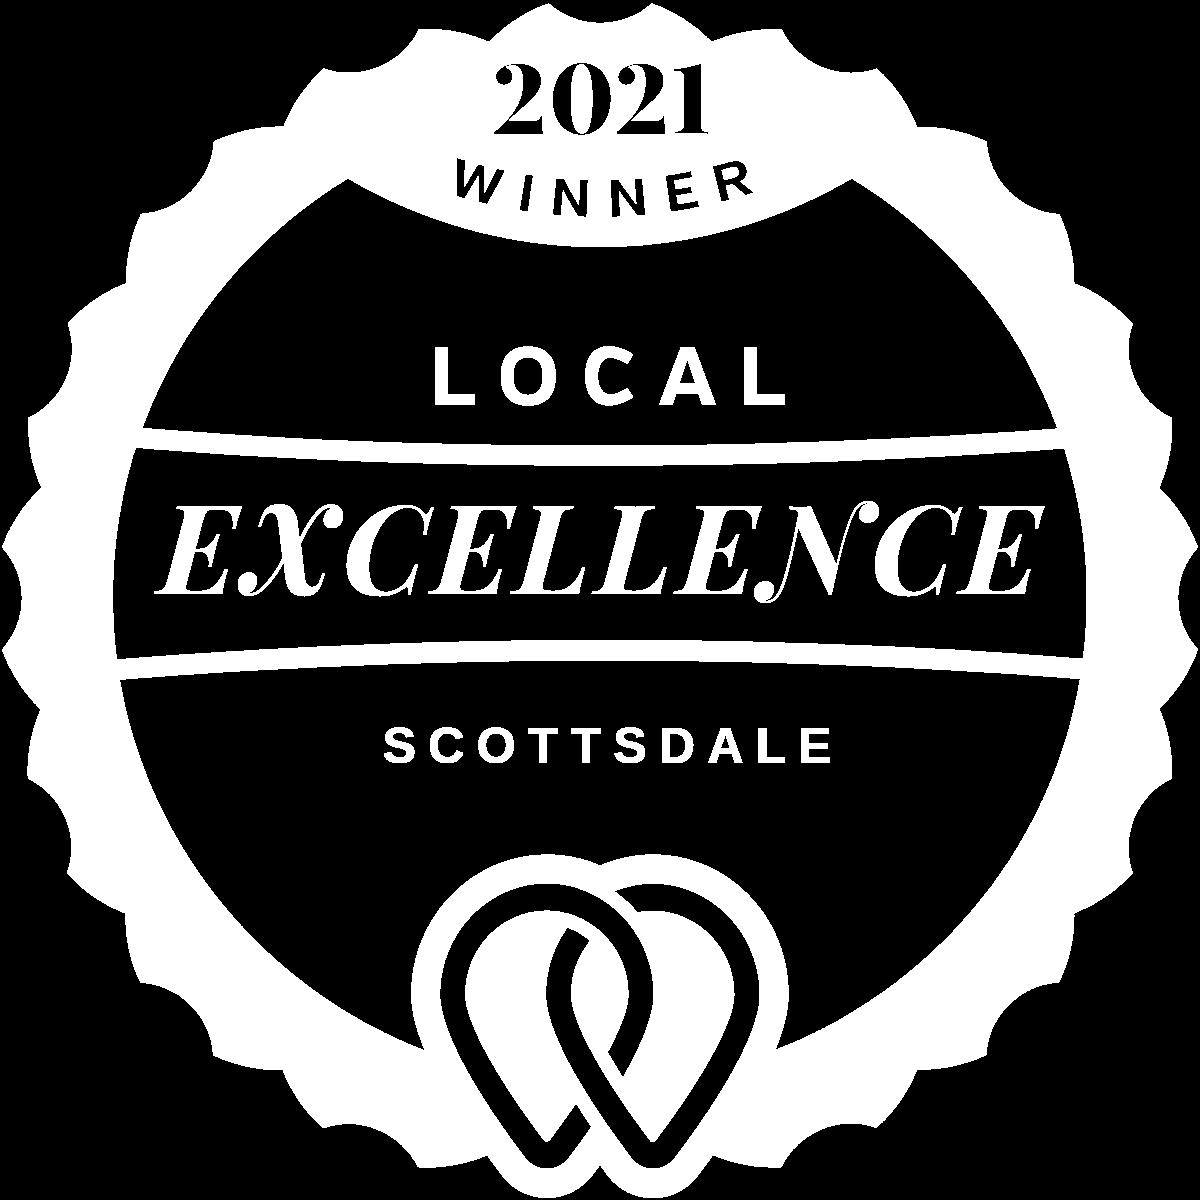 2021 Local Excellence Winner in Scottsdale, AZ